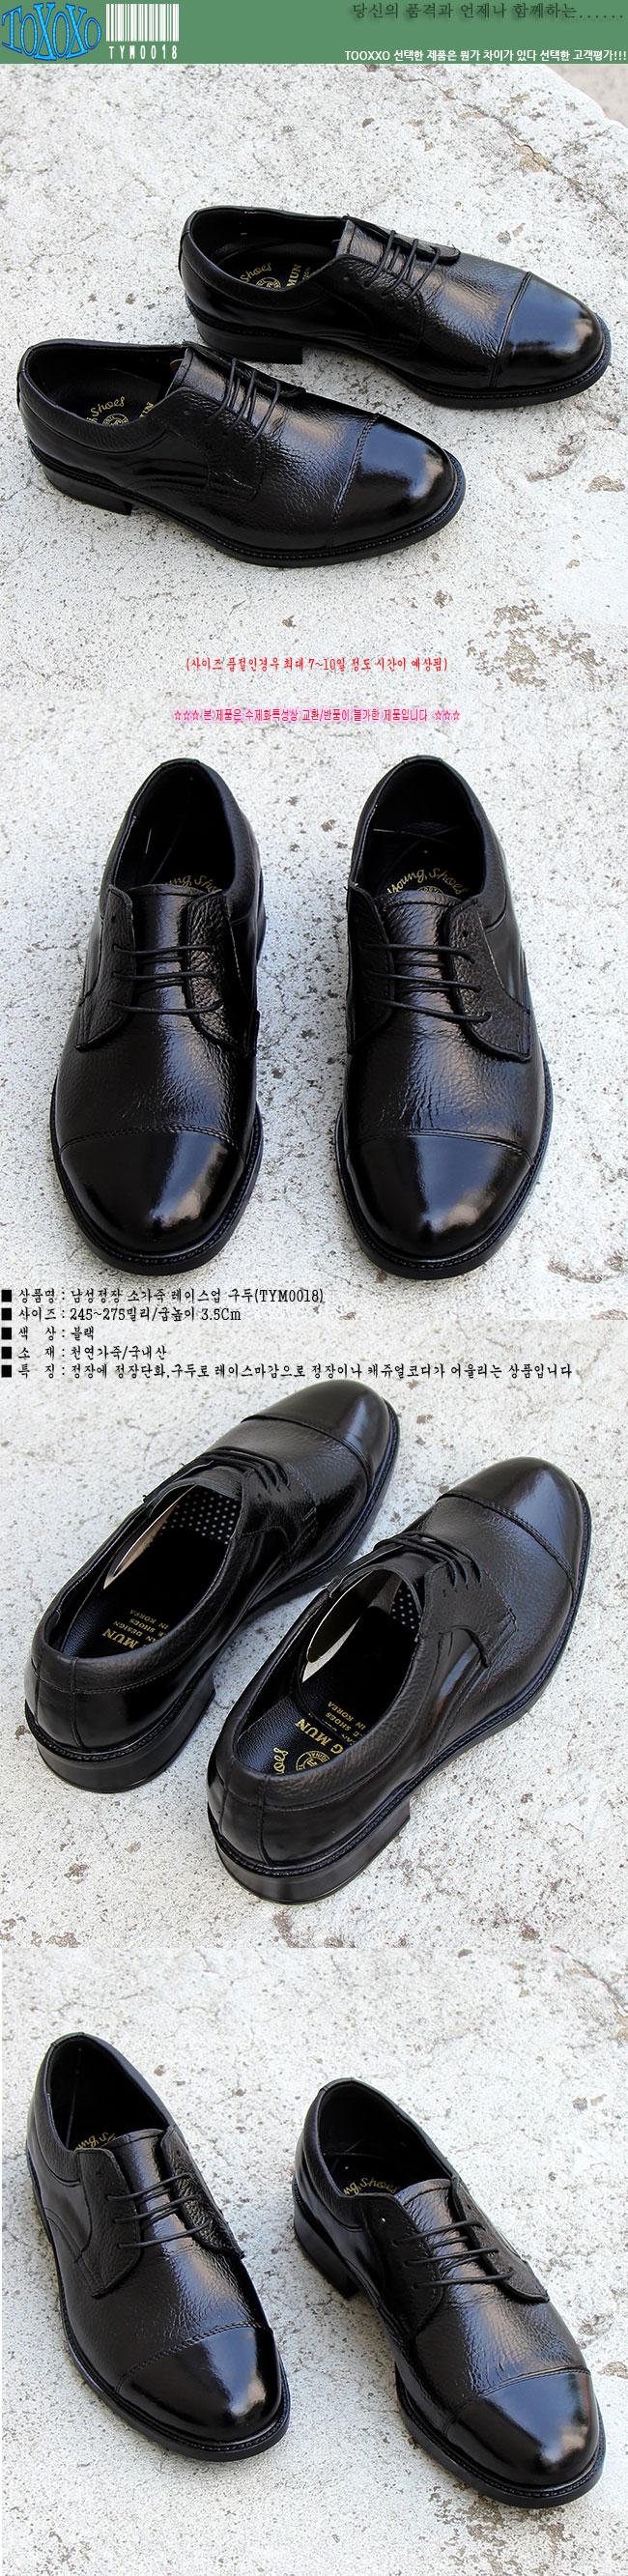 f9aea981661 TYM0018 토쏘쏘 남성 정장 구두 남자 맞춤 수제화 중년 남성 쇼핑몰 ...